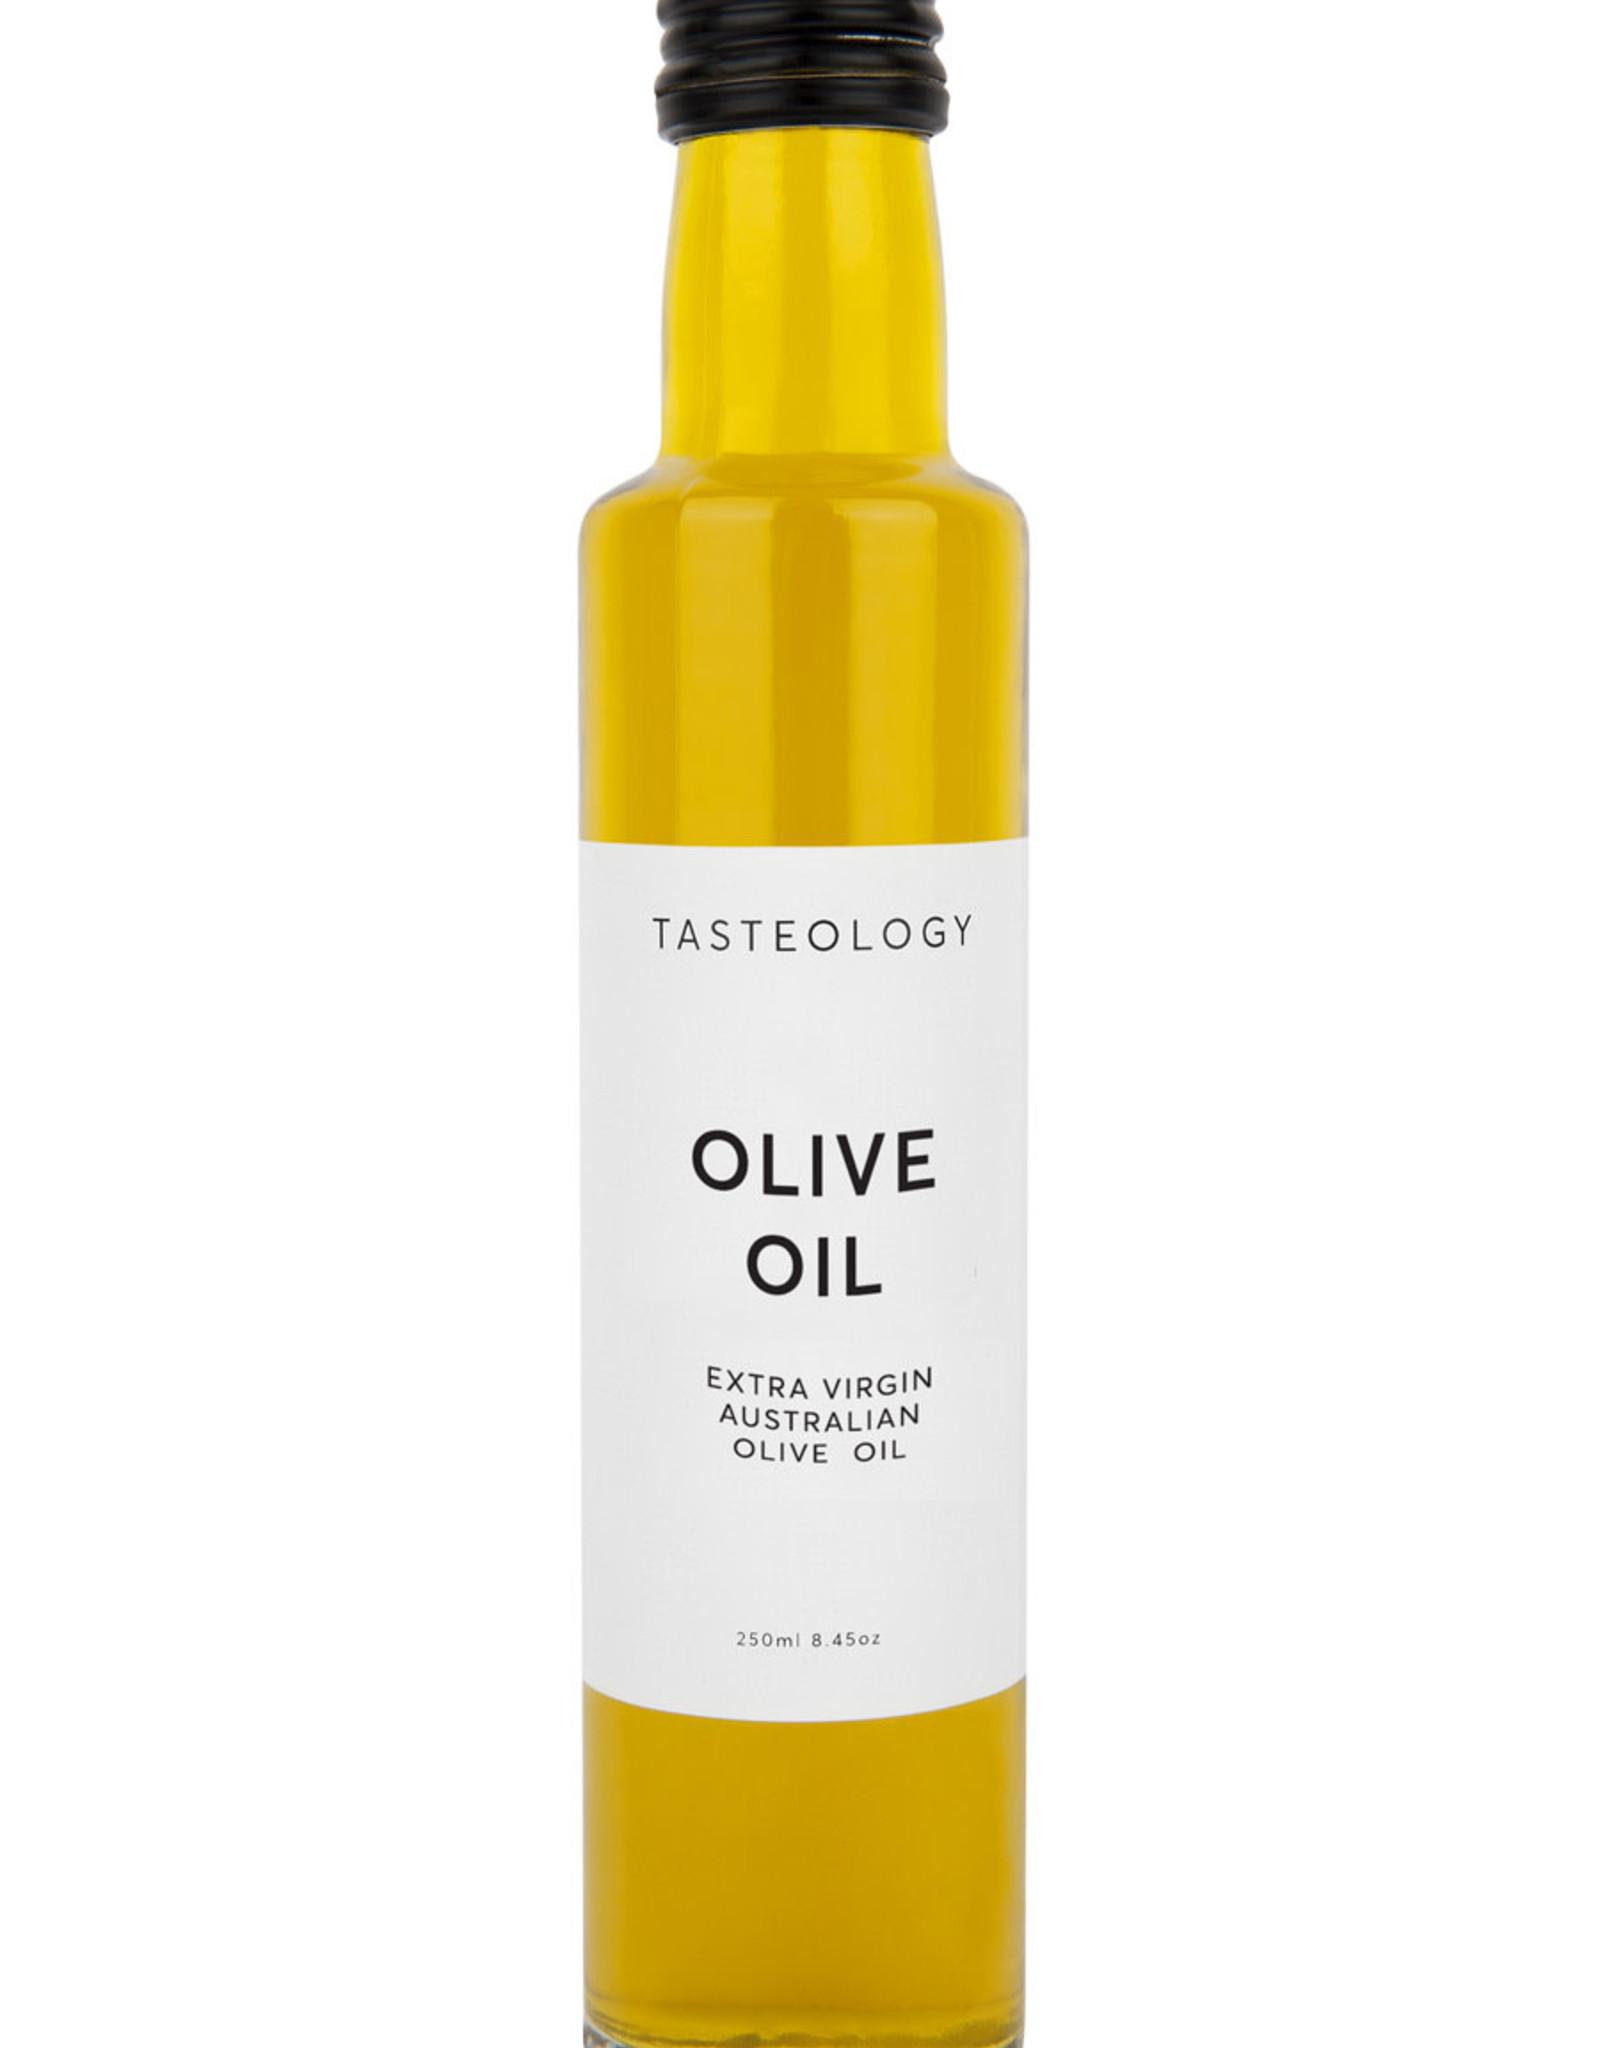 Tasteology Extra Virgin Olive Oil